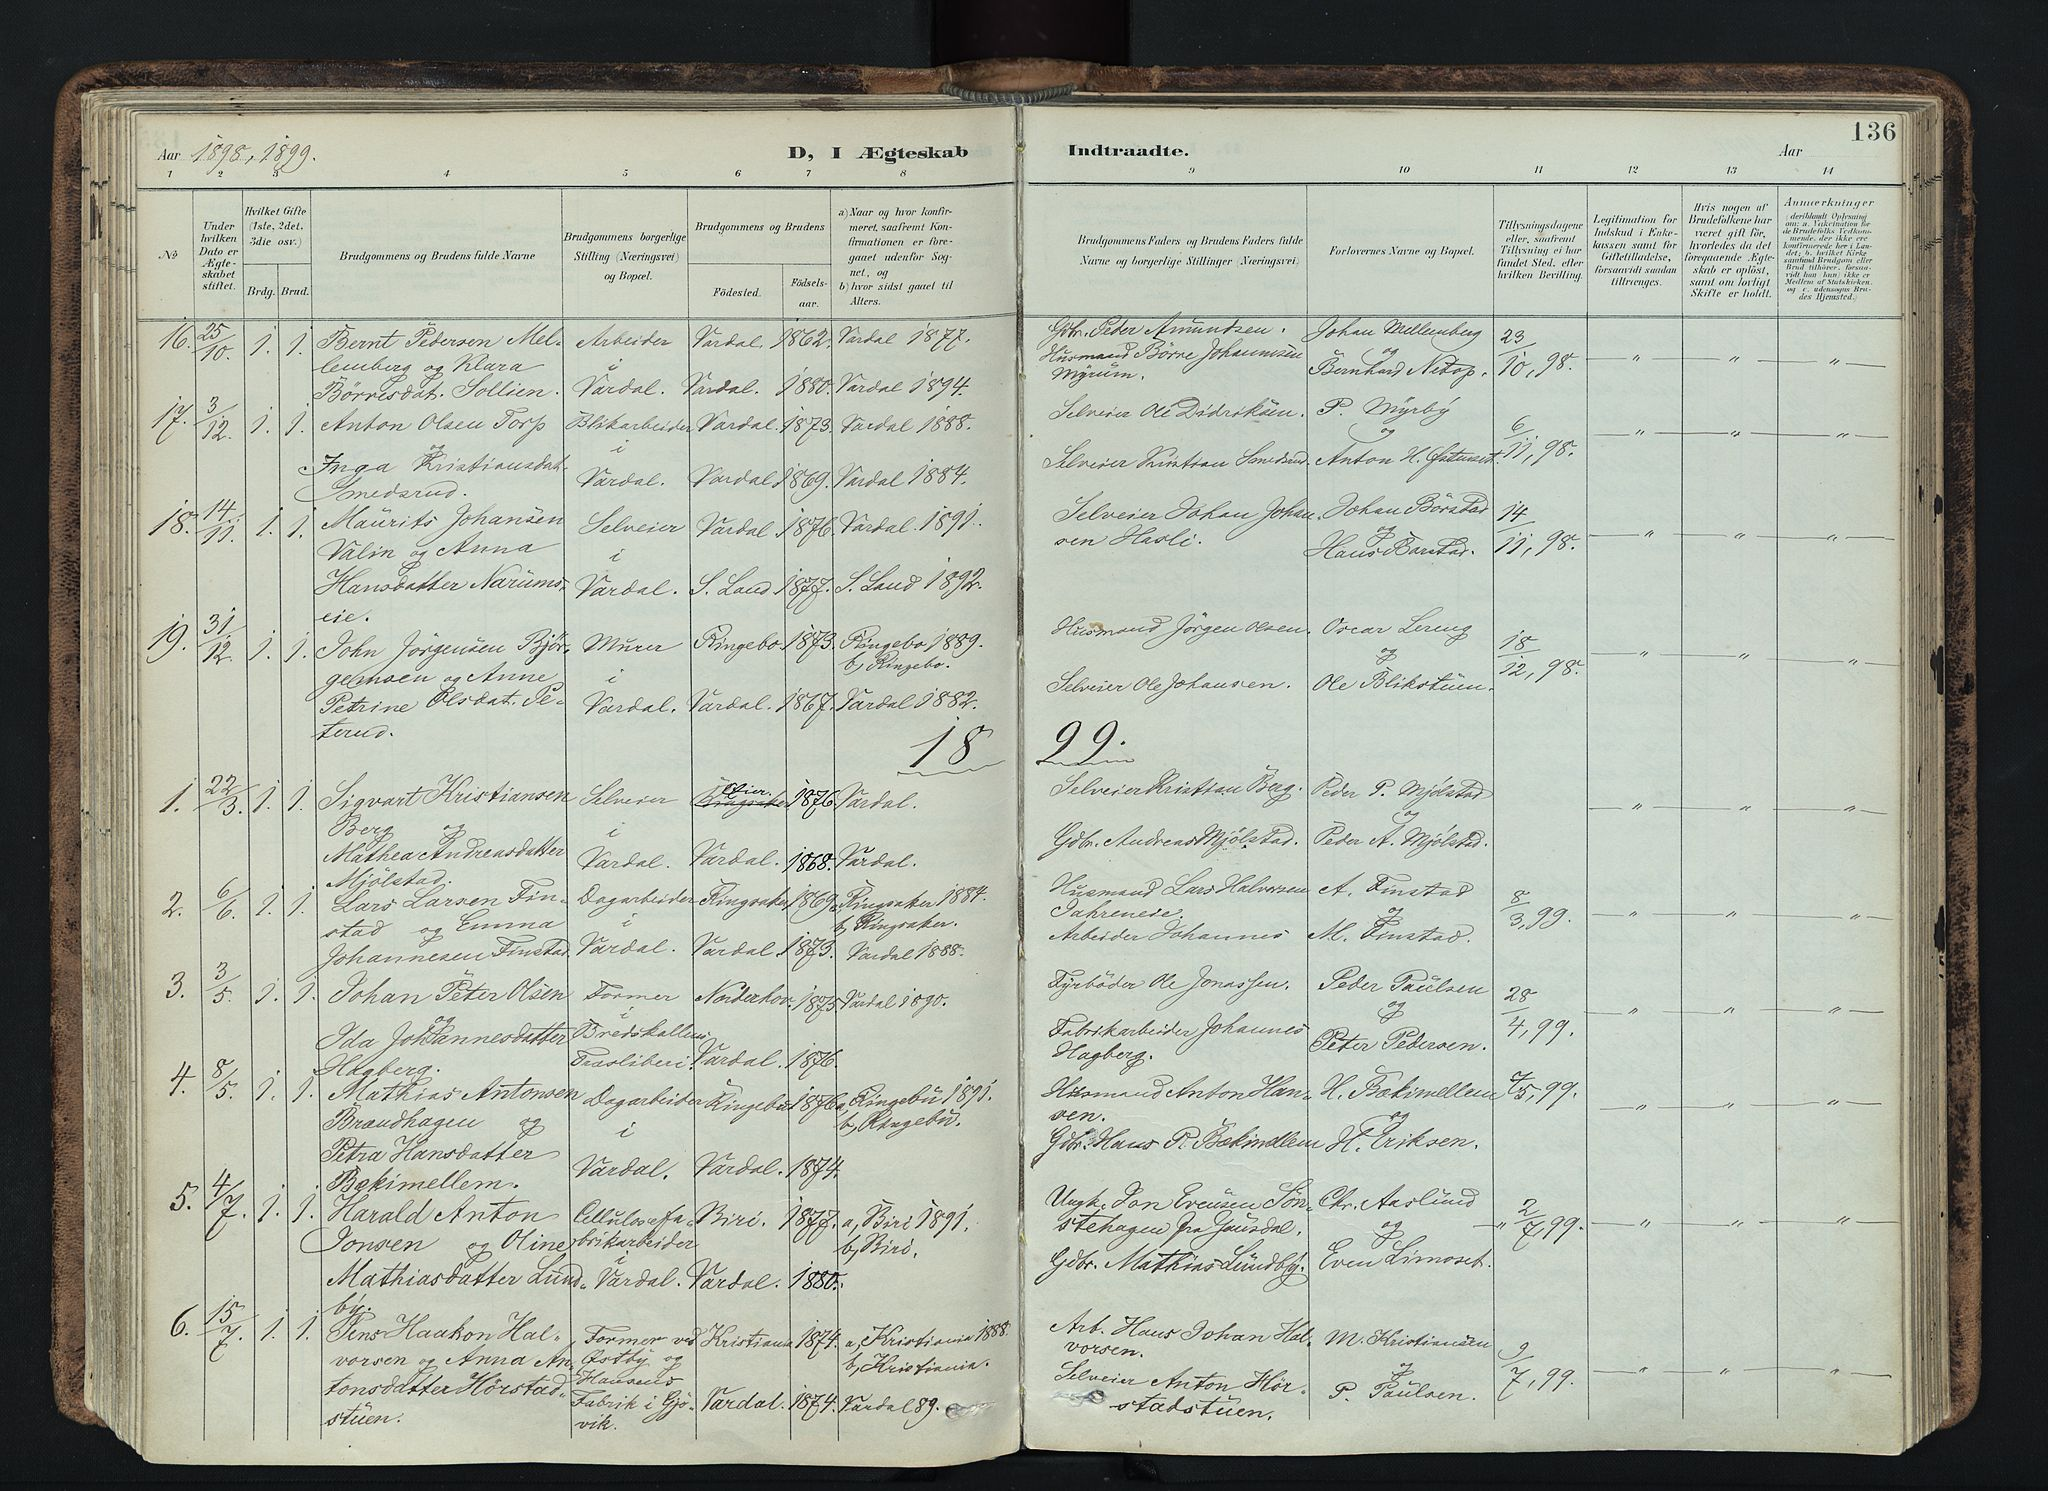 SAH, Vardal prestekontor, H/Ha/Haa/L0019: Ministerialbok nr. 19, 1893-1907, s. 136